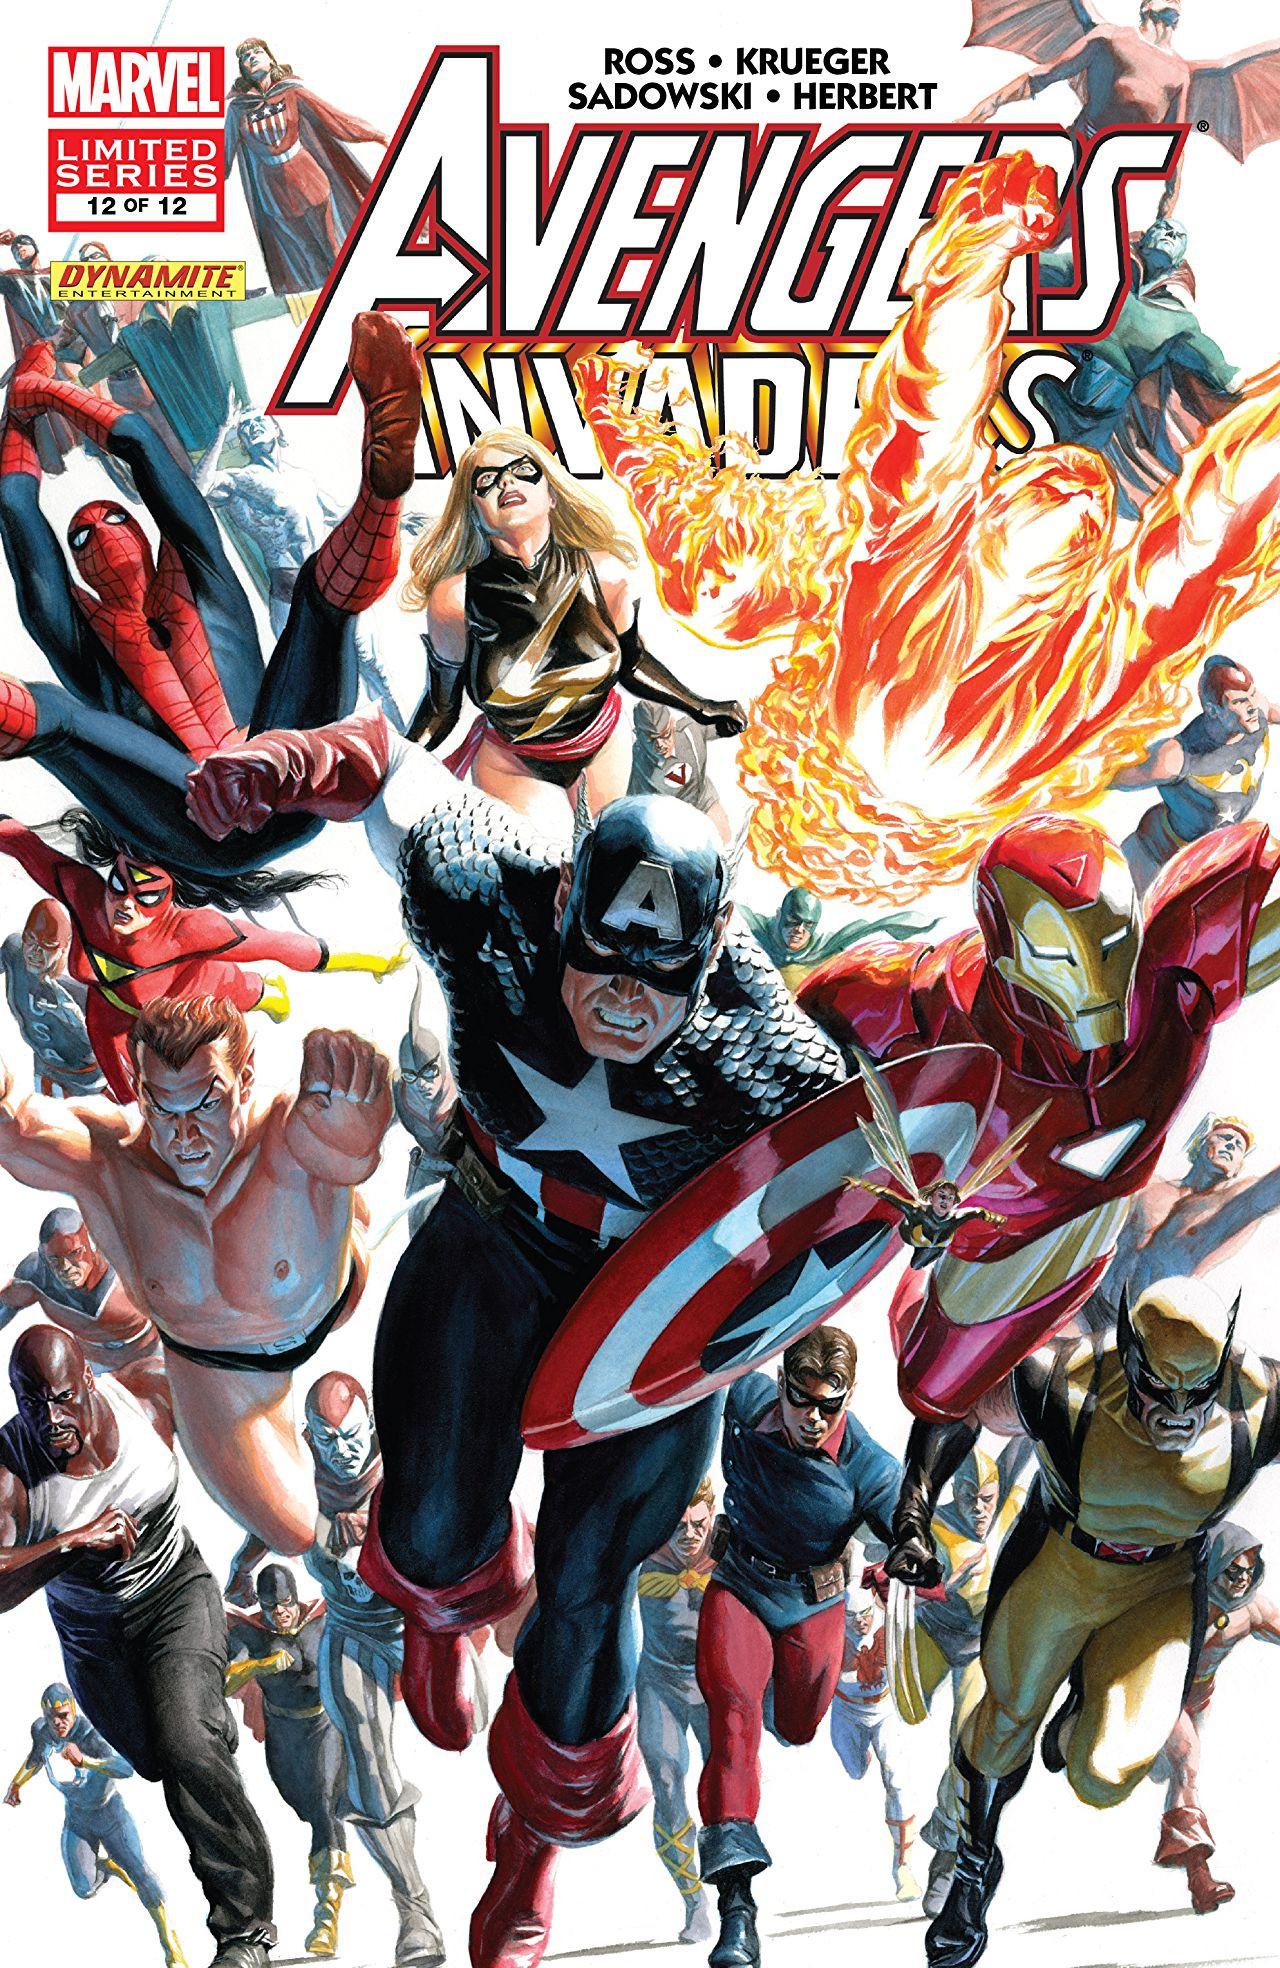 Avengers Invaders Vol 1 12